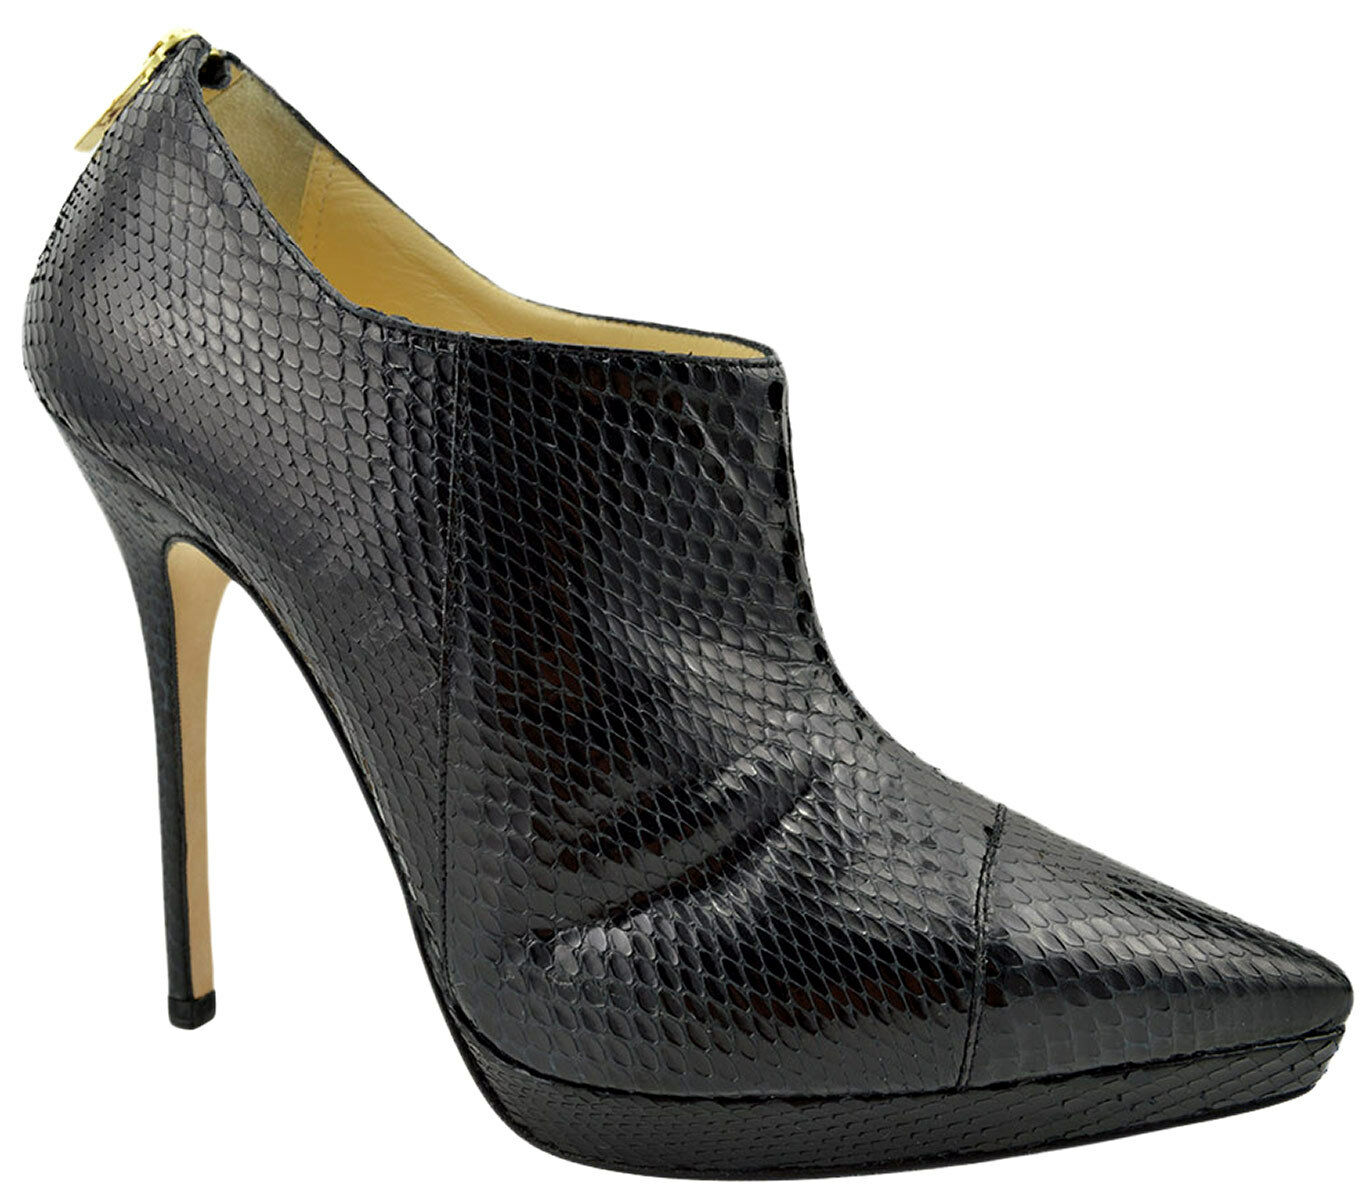 $1.495 JIMMY CHOO Black Snake Leather